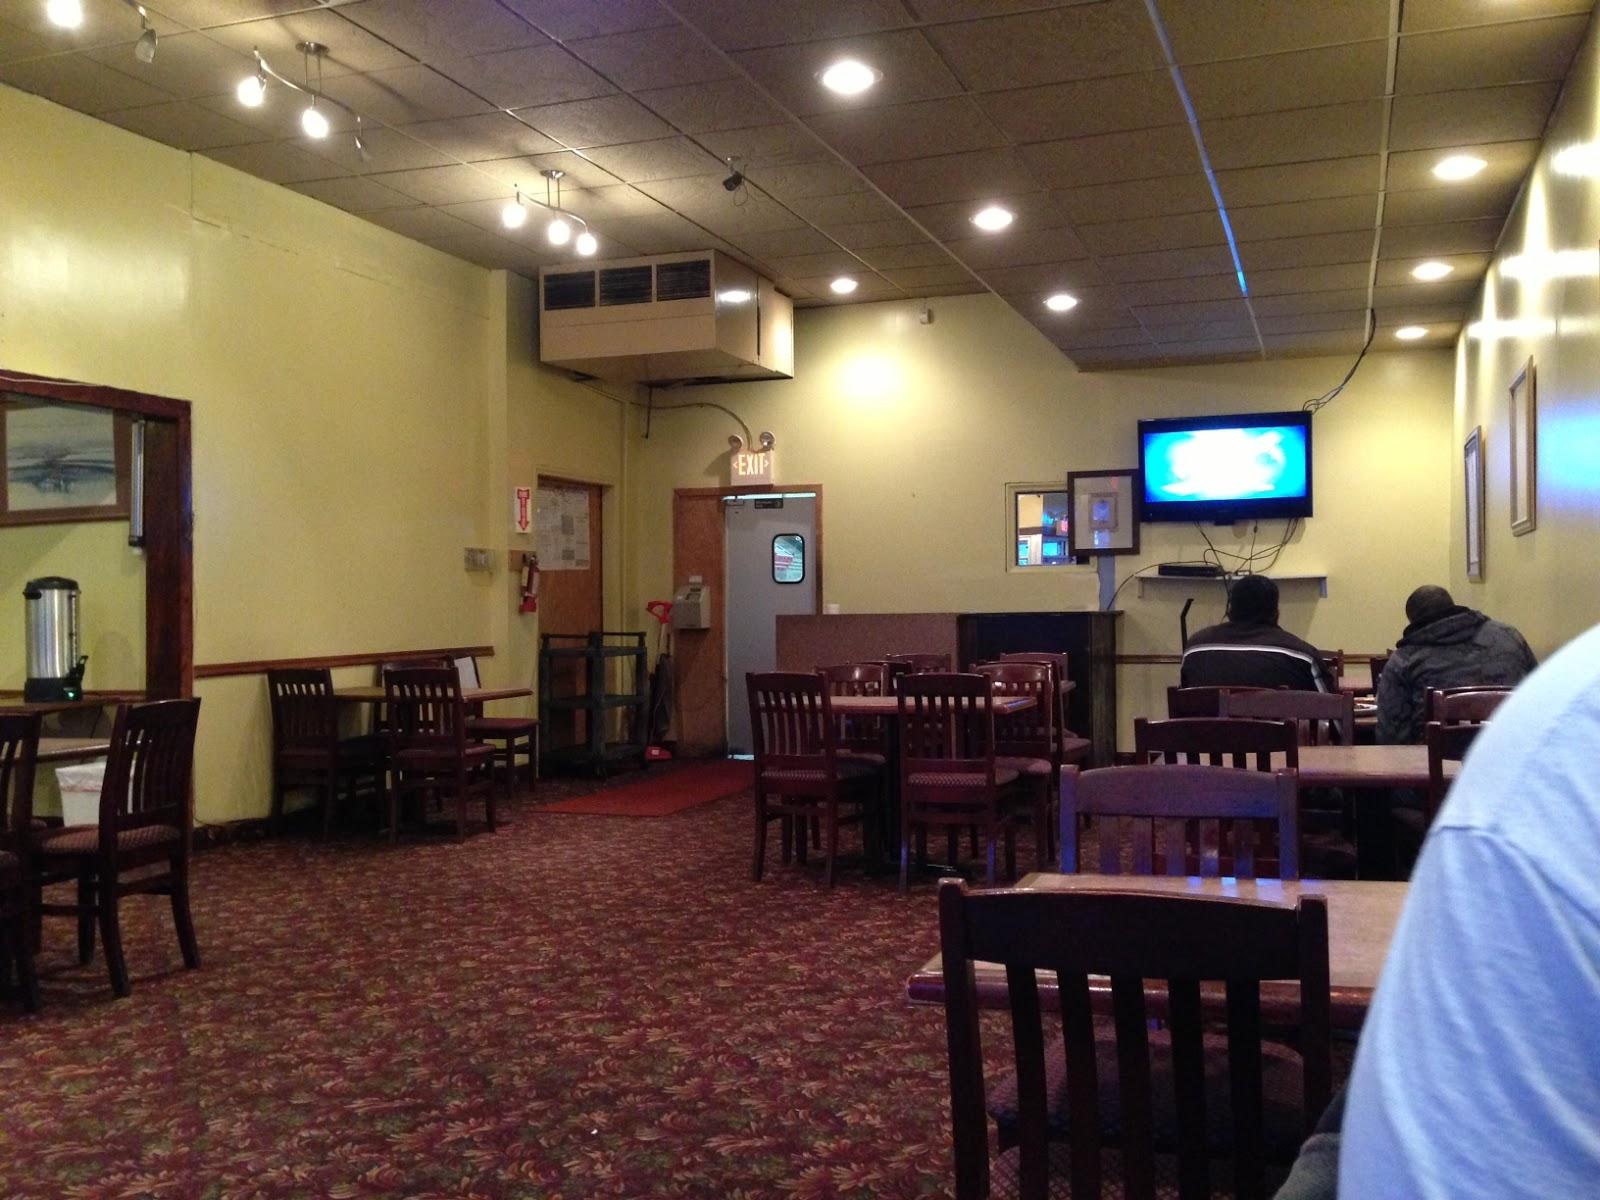 Restaurants Minneapolis Mn | Best Restaurants Near Me - photo#41